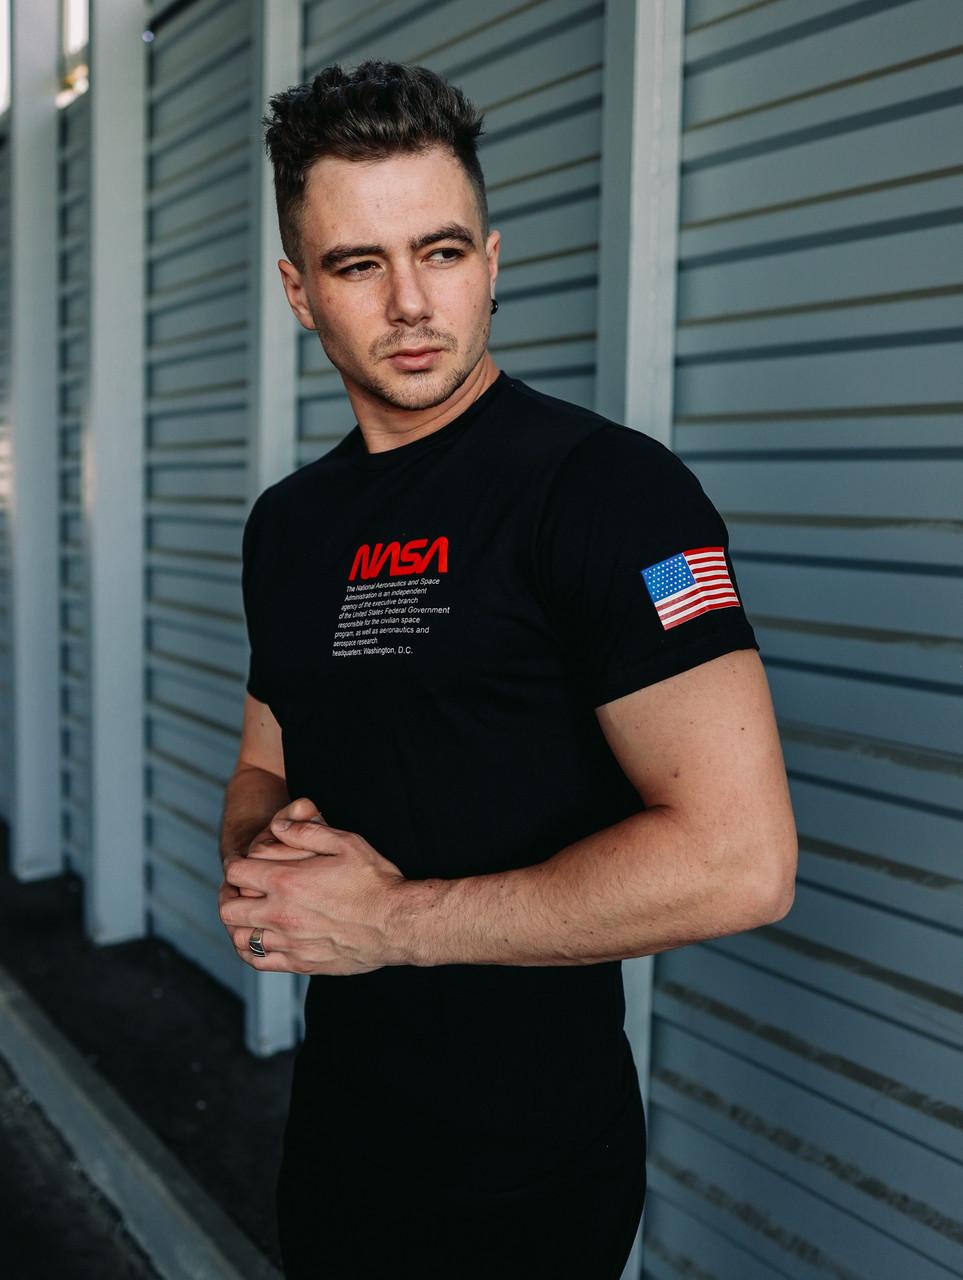 Мужская футболка Nasa (black), черная мужская футболка Наса